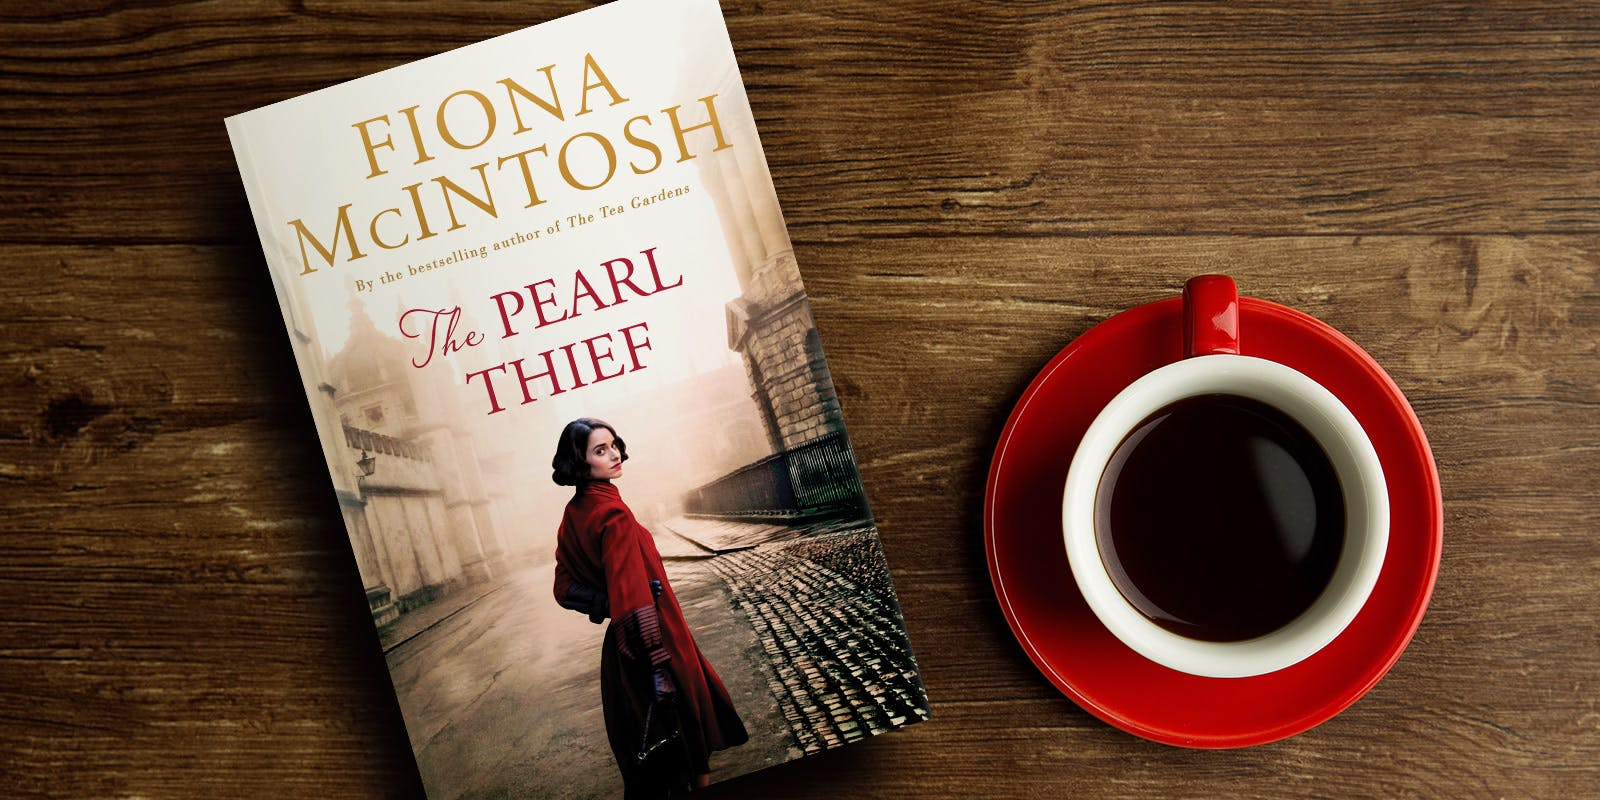 The Pearl Thief book club notes